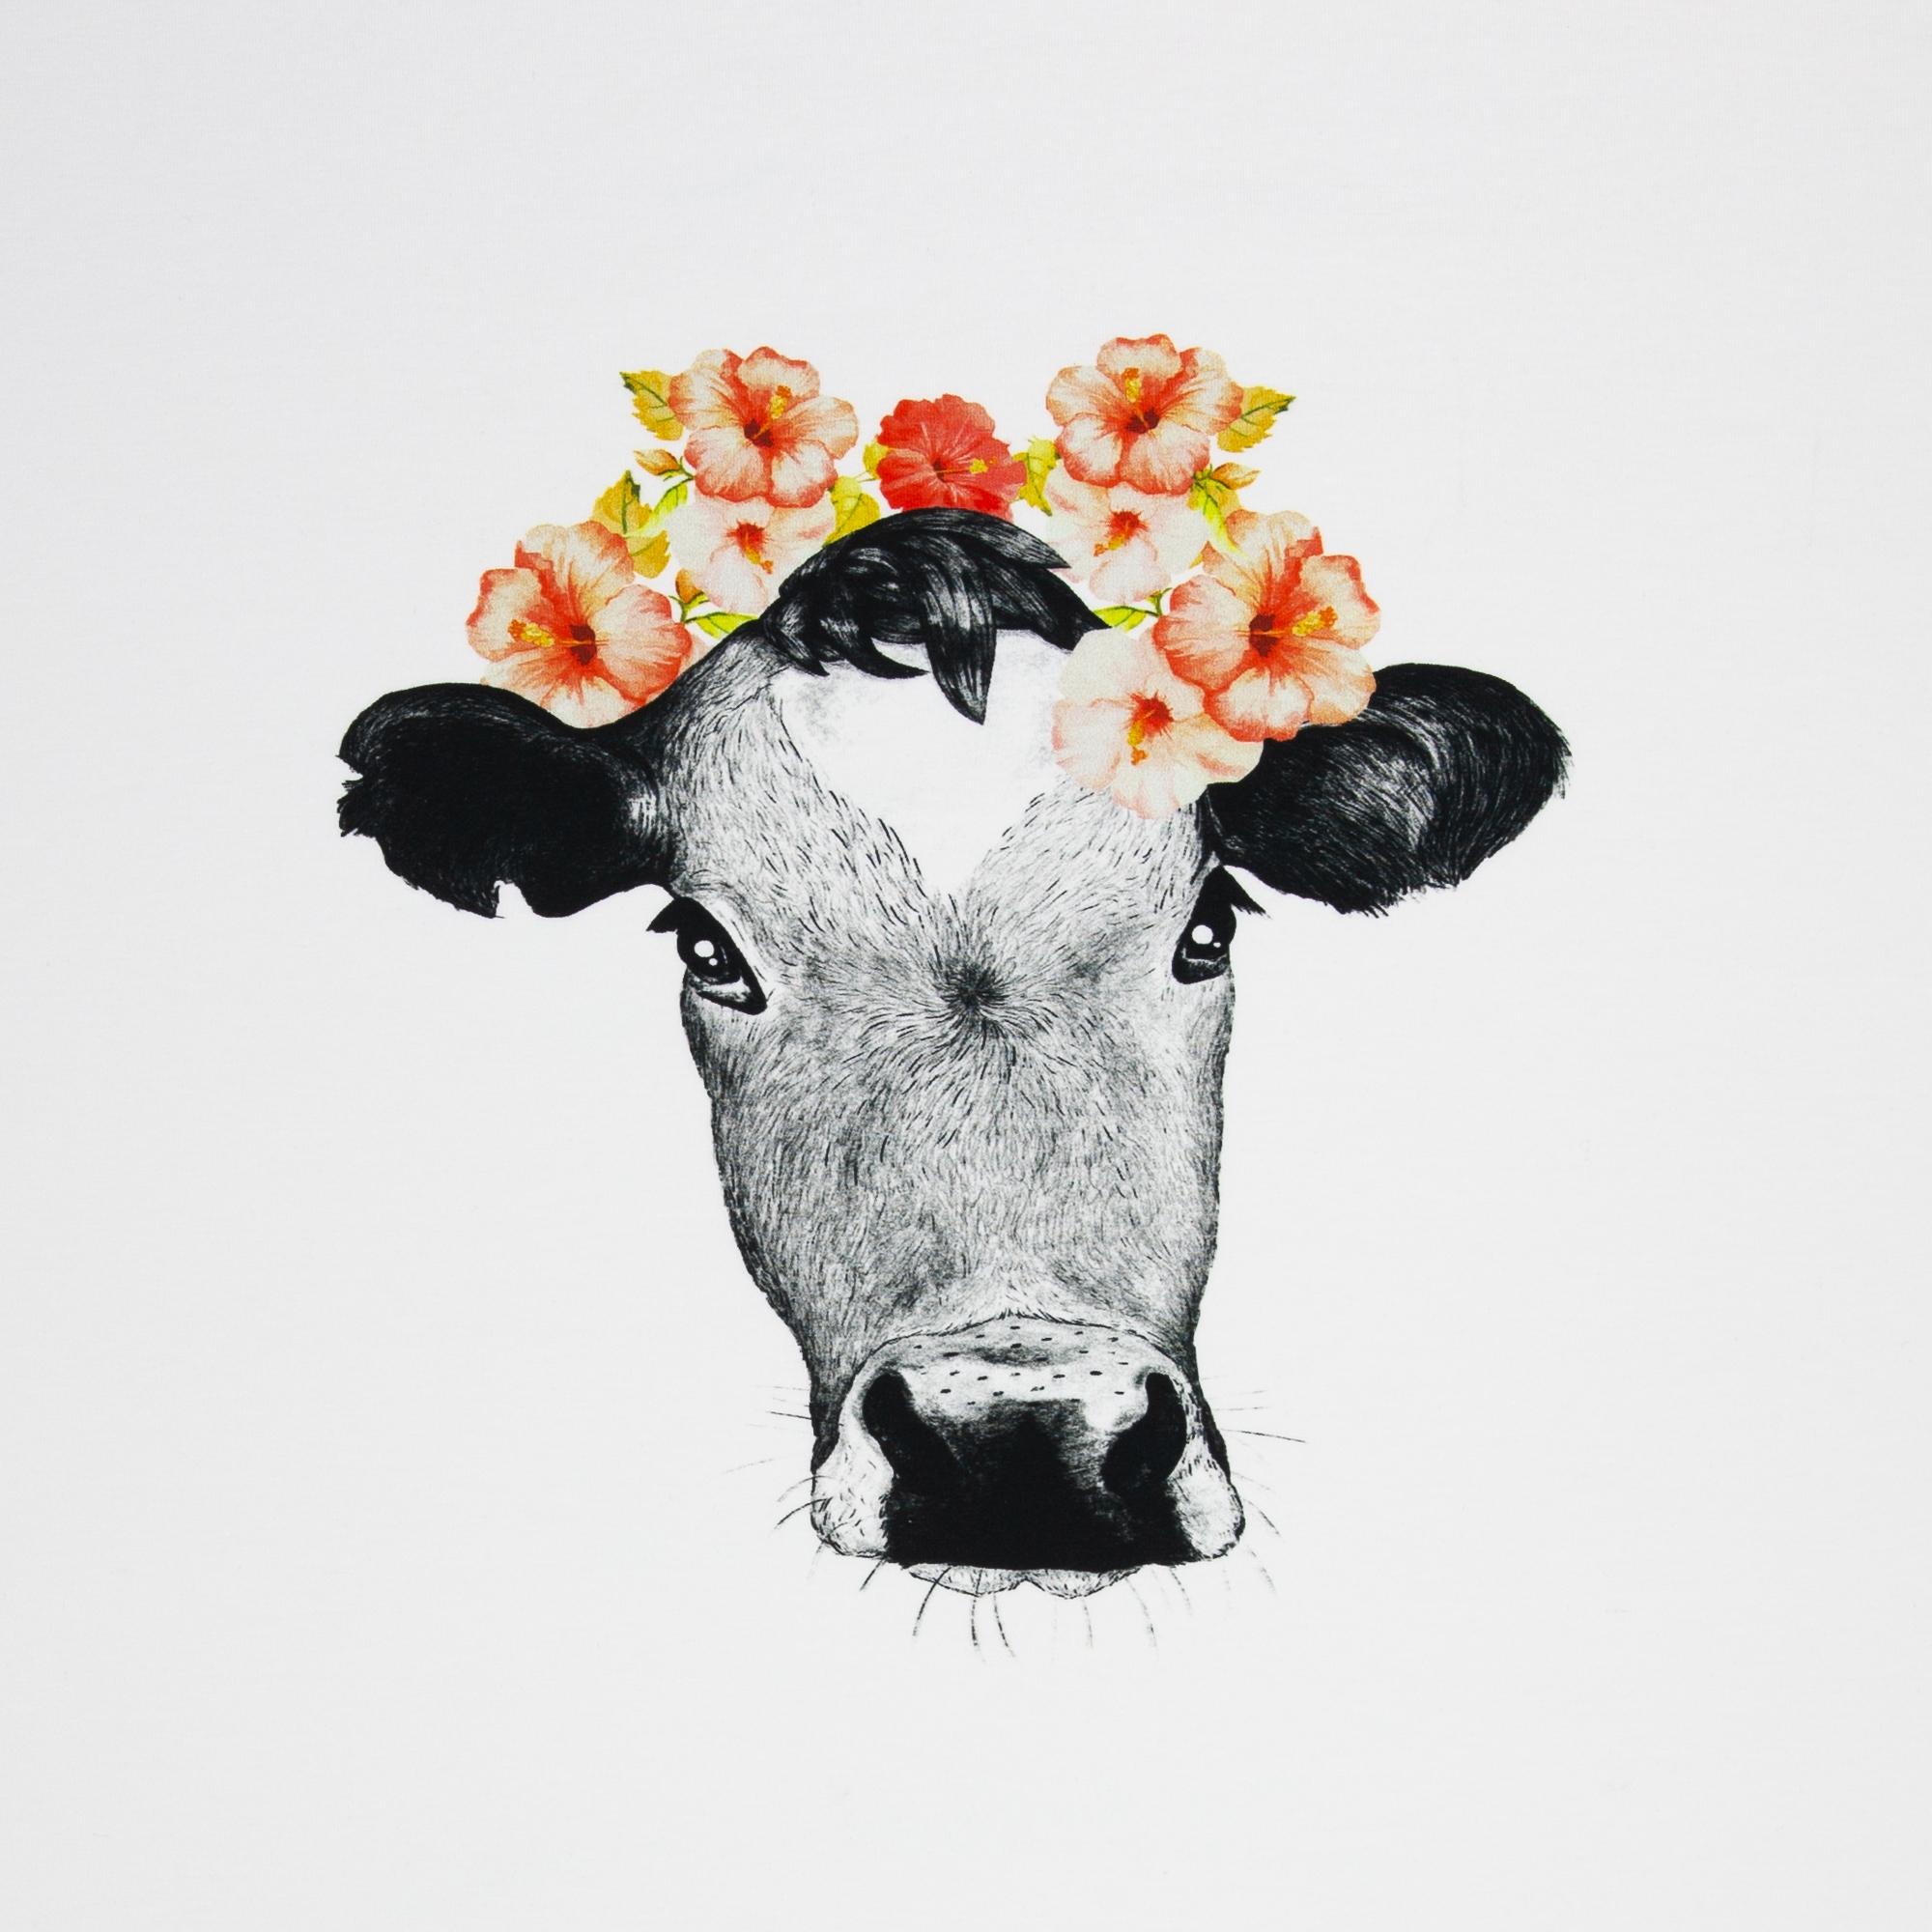 Baumwolljersey Panel Kuh Tessa mit Blumen